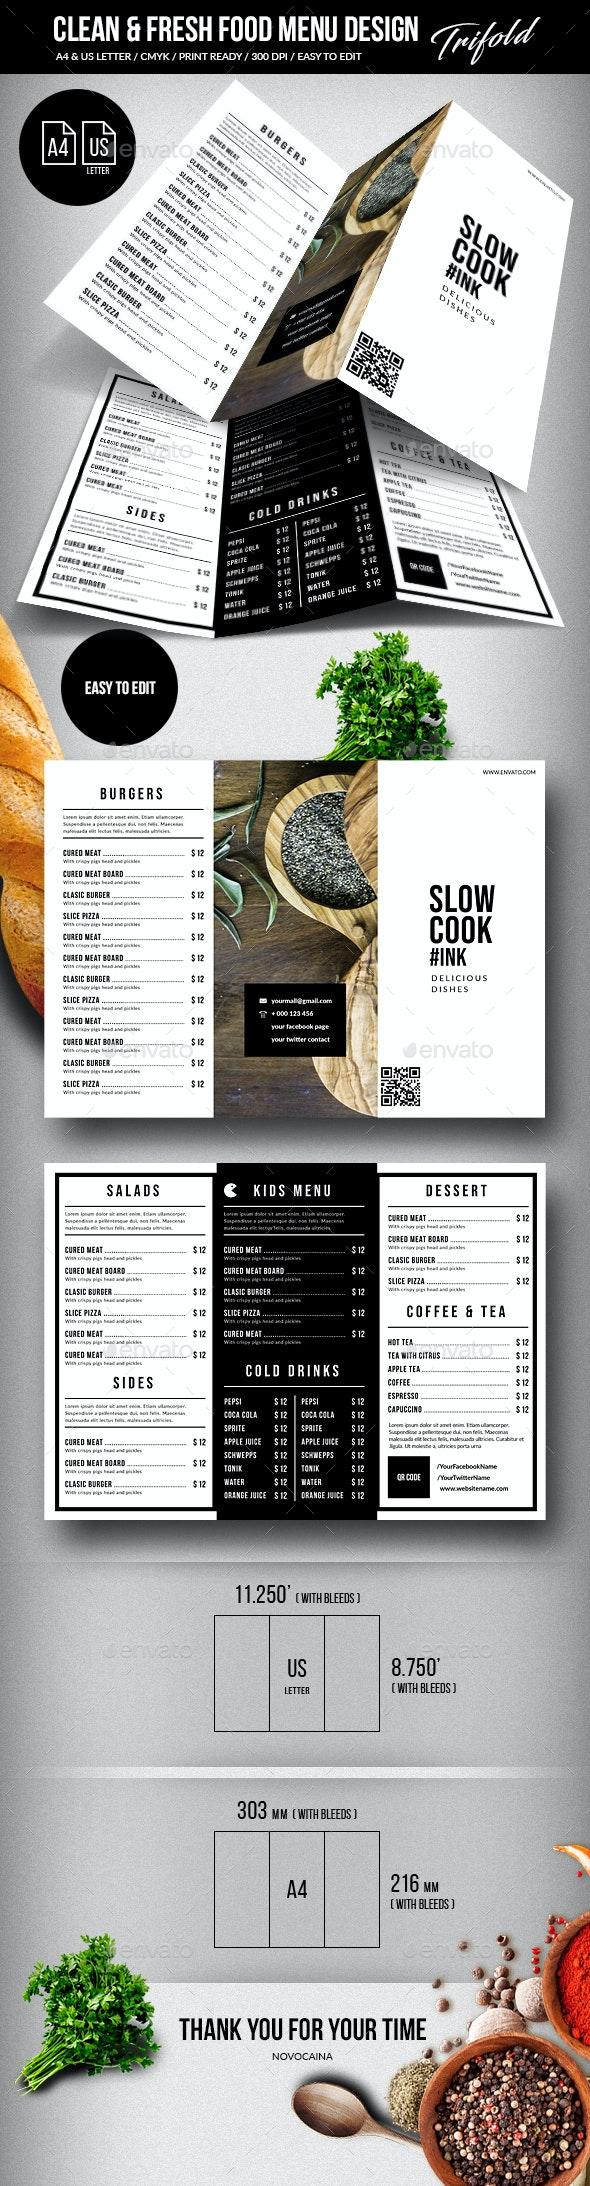 Clean & Fresh A4 & US Letter Trifold Food Menu - Food Menus Print Templates